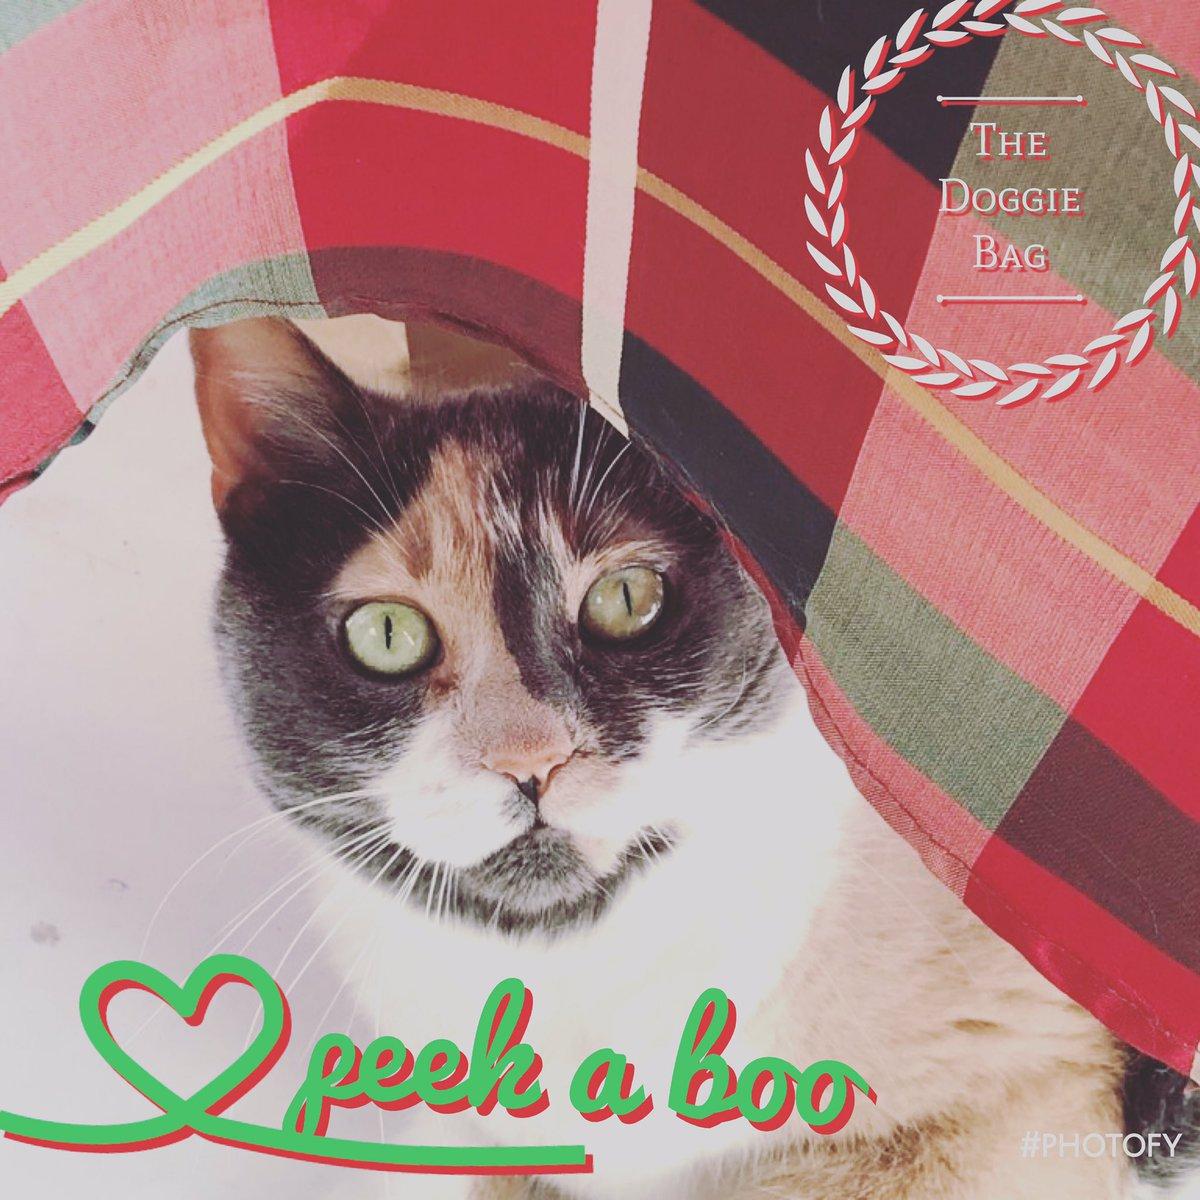 Love our Cookie!  #shopcat #shopcats #catsatwork #workingcat #calicocat #calicocatsrule #calicocatsofinstagram #calicocats #cats #catsrule #catlife #catlife #thedoggiebag #catlover #petboutique #catlovers #catloversclub #lakelandflorida #lakelandflpic.twitter.com/5WvZqhSBUd